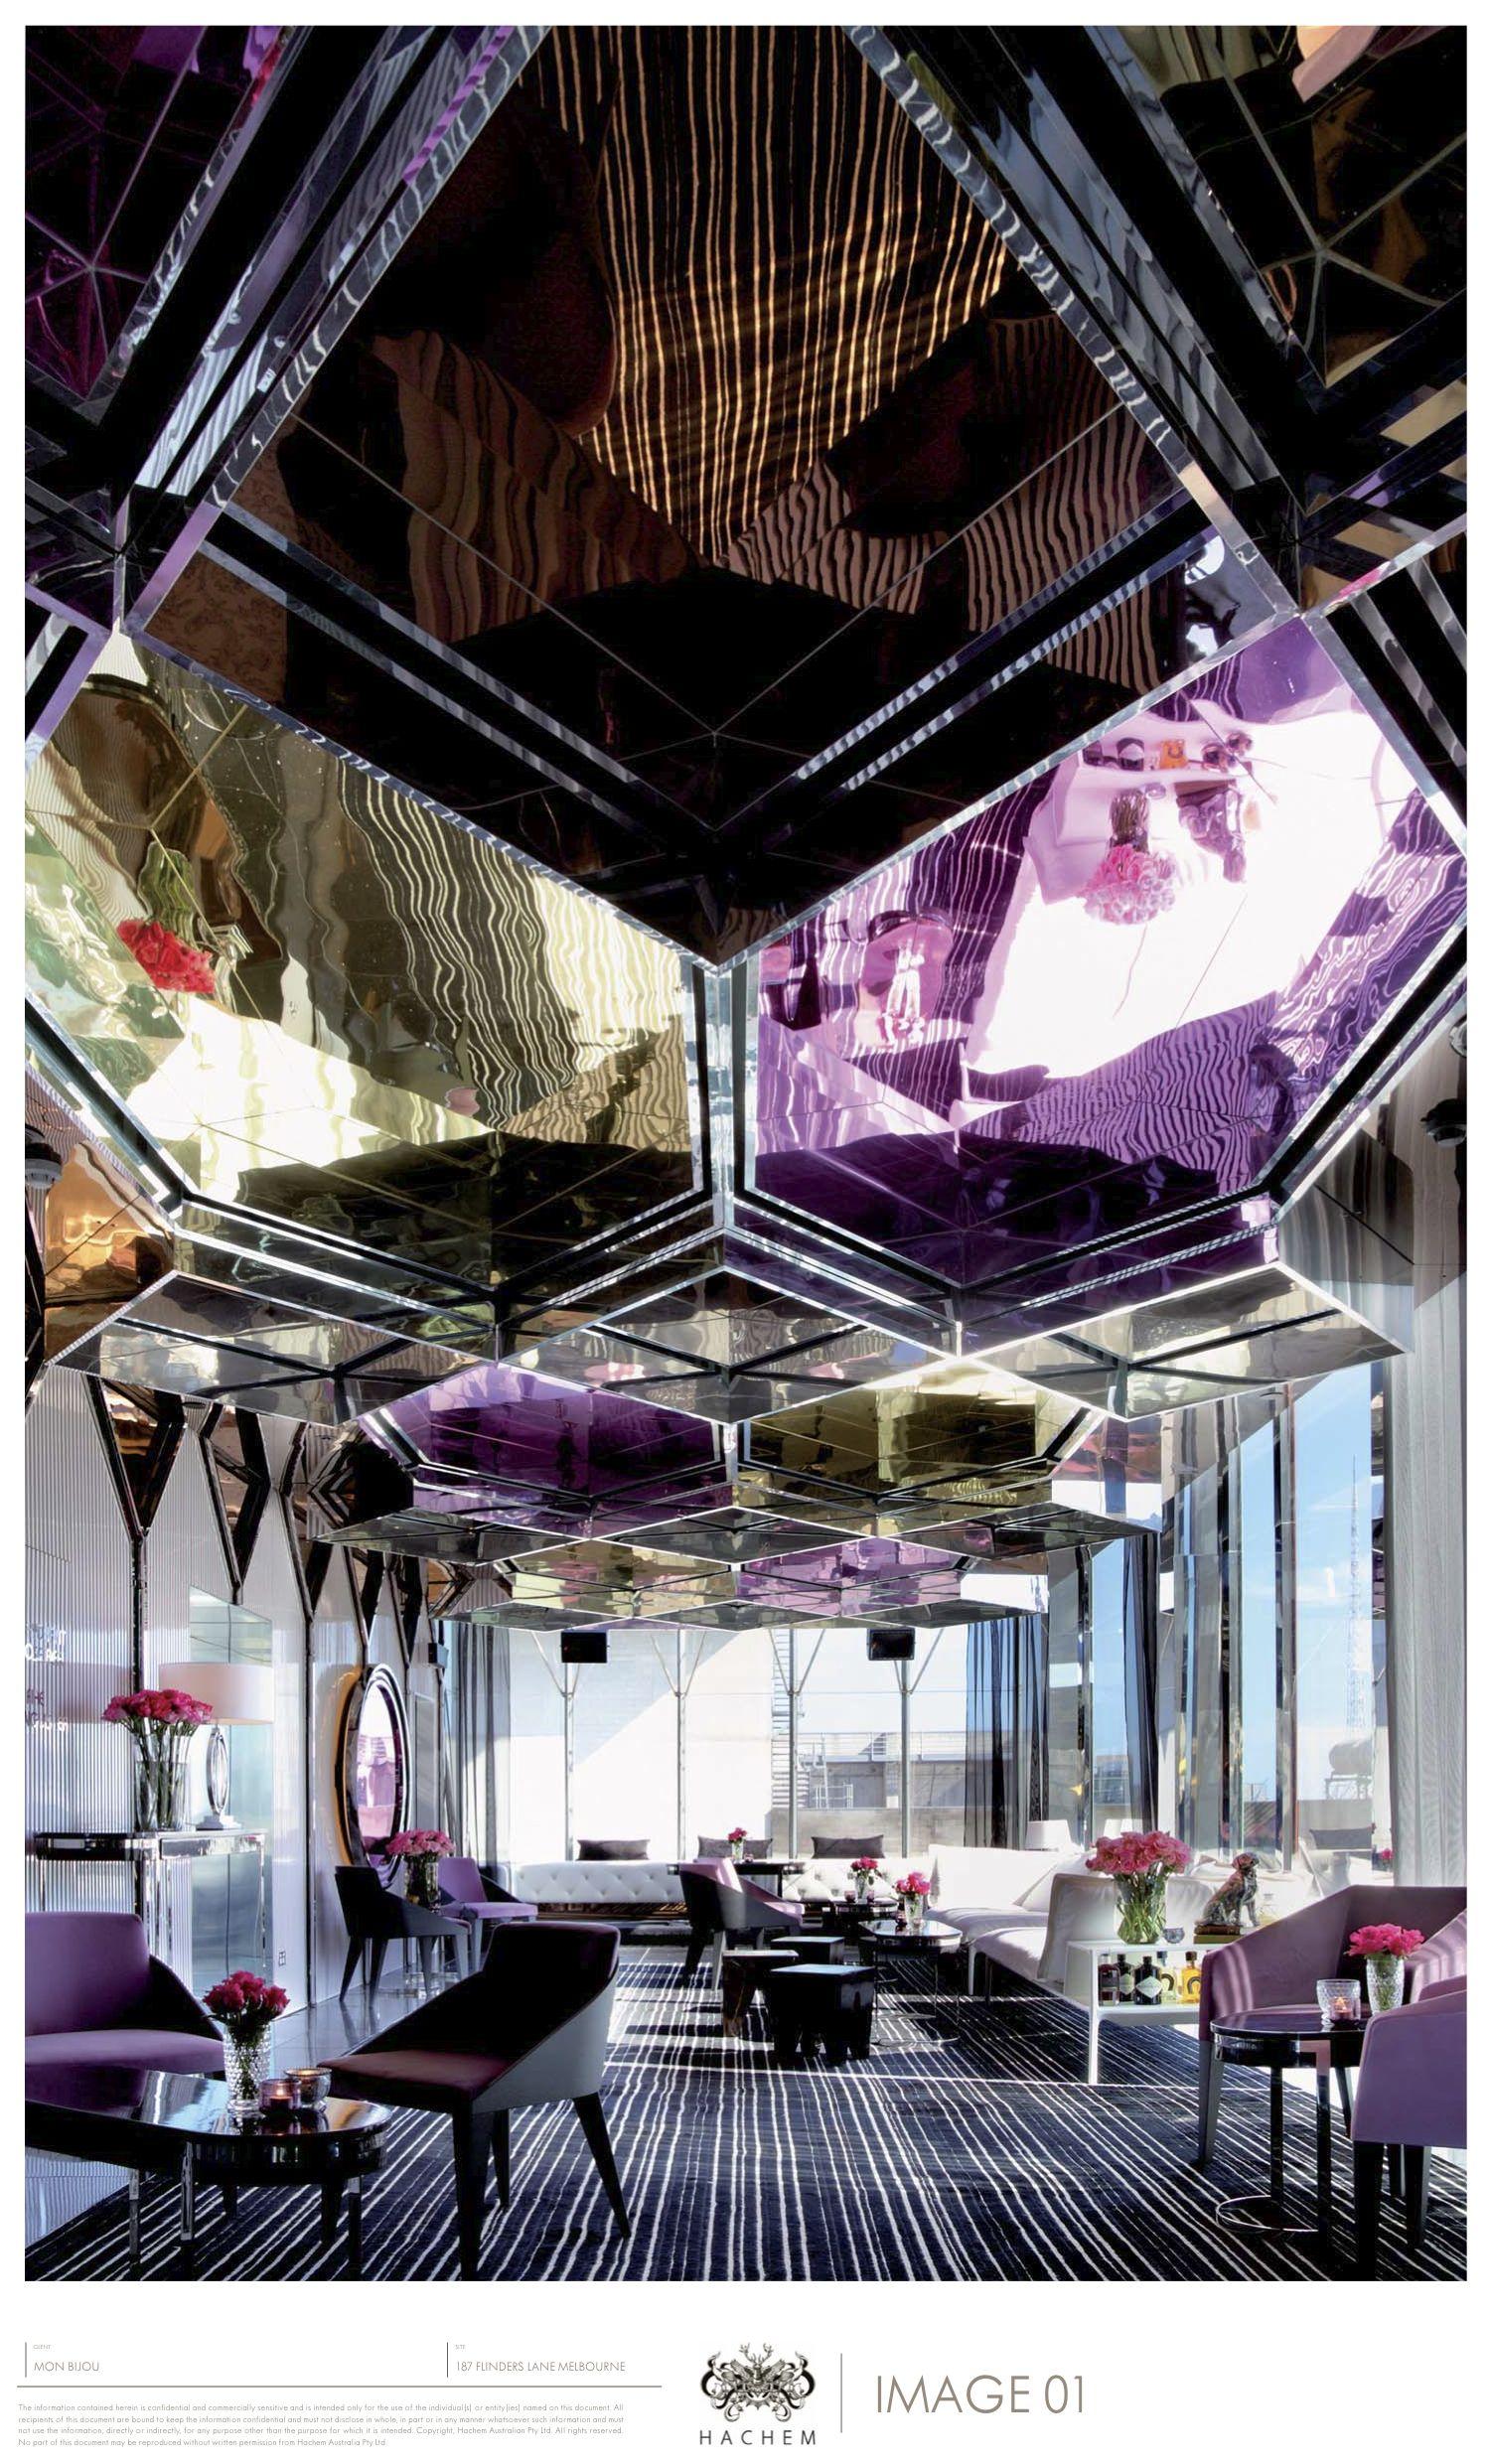 Mon Bijou Level 10 Adelphi Hotel Melbourne Australia Stunning Restaurant Interior DesignDesign